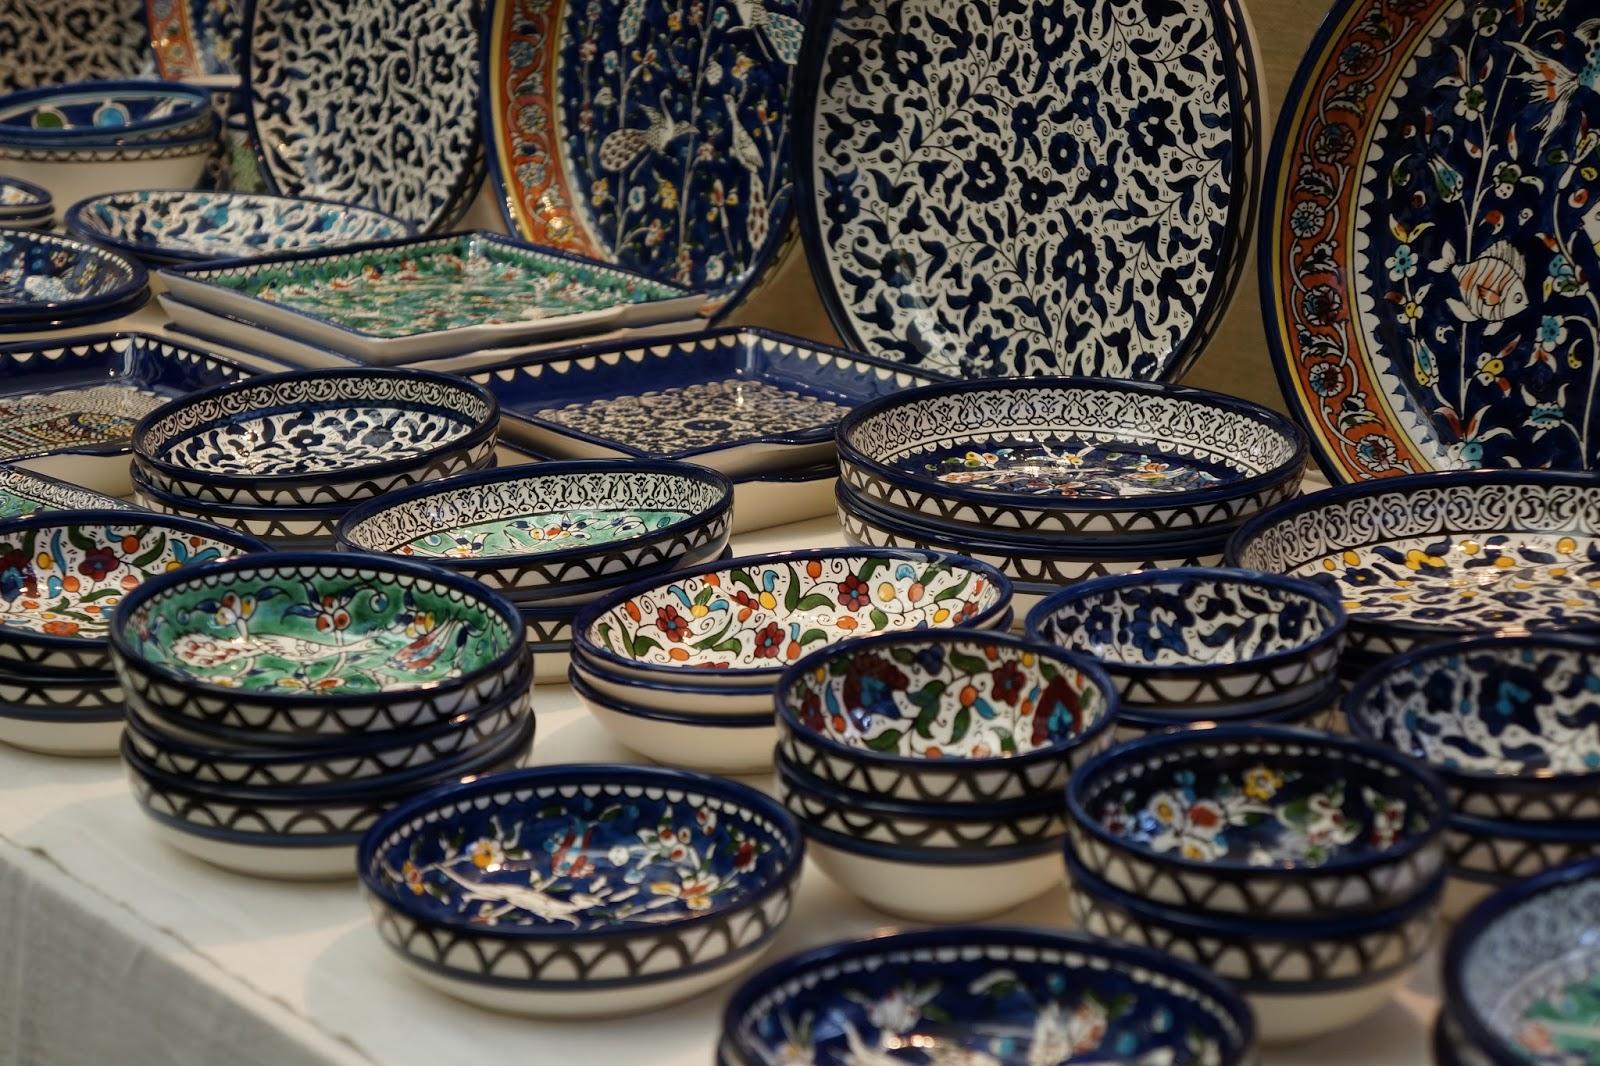 ornamental plates at greenwich market stall